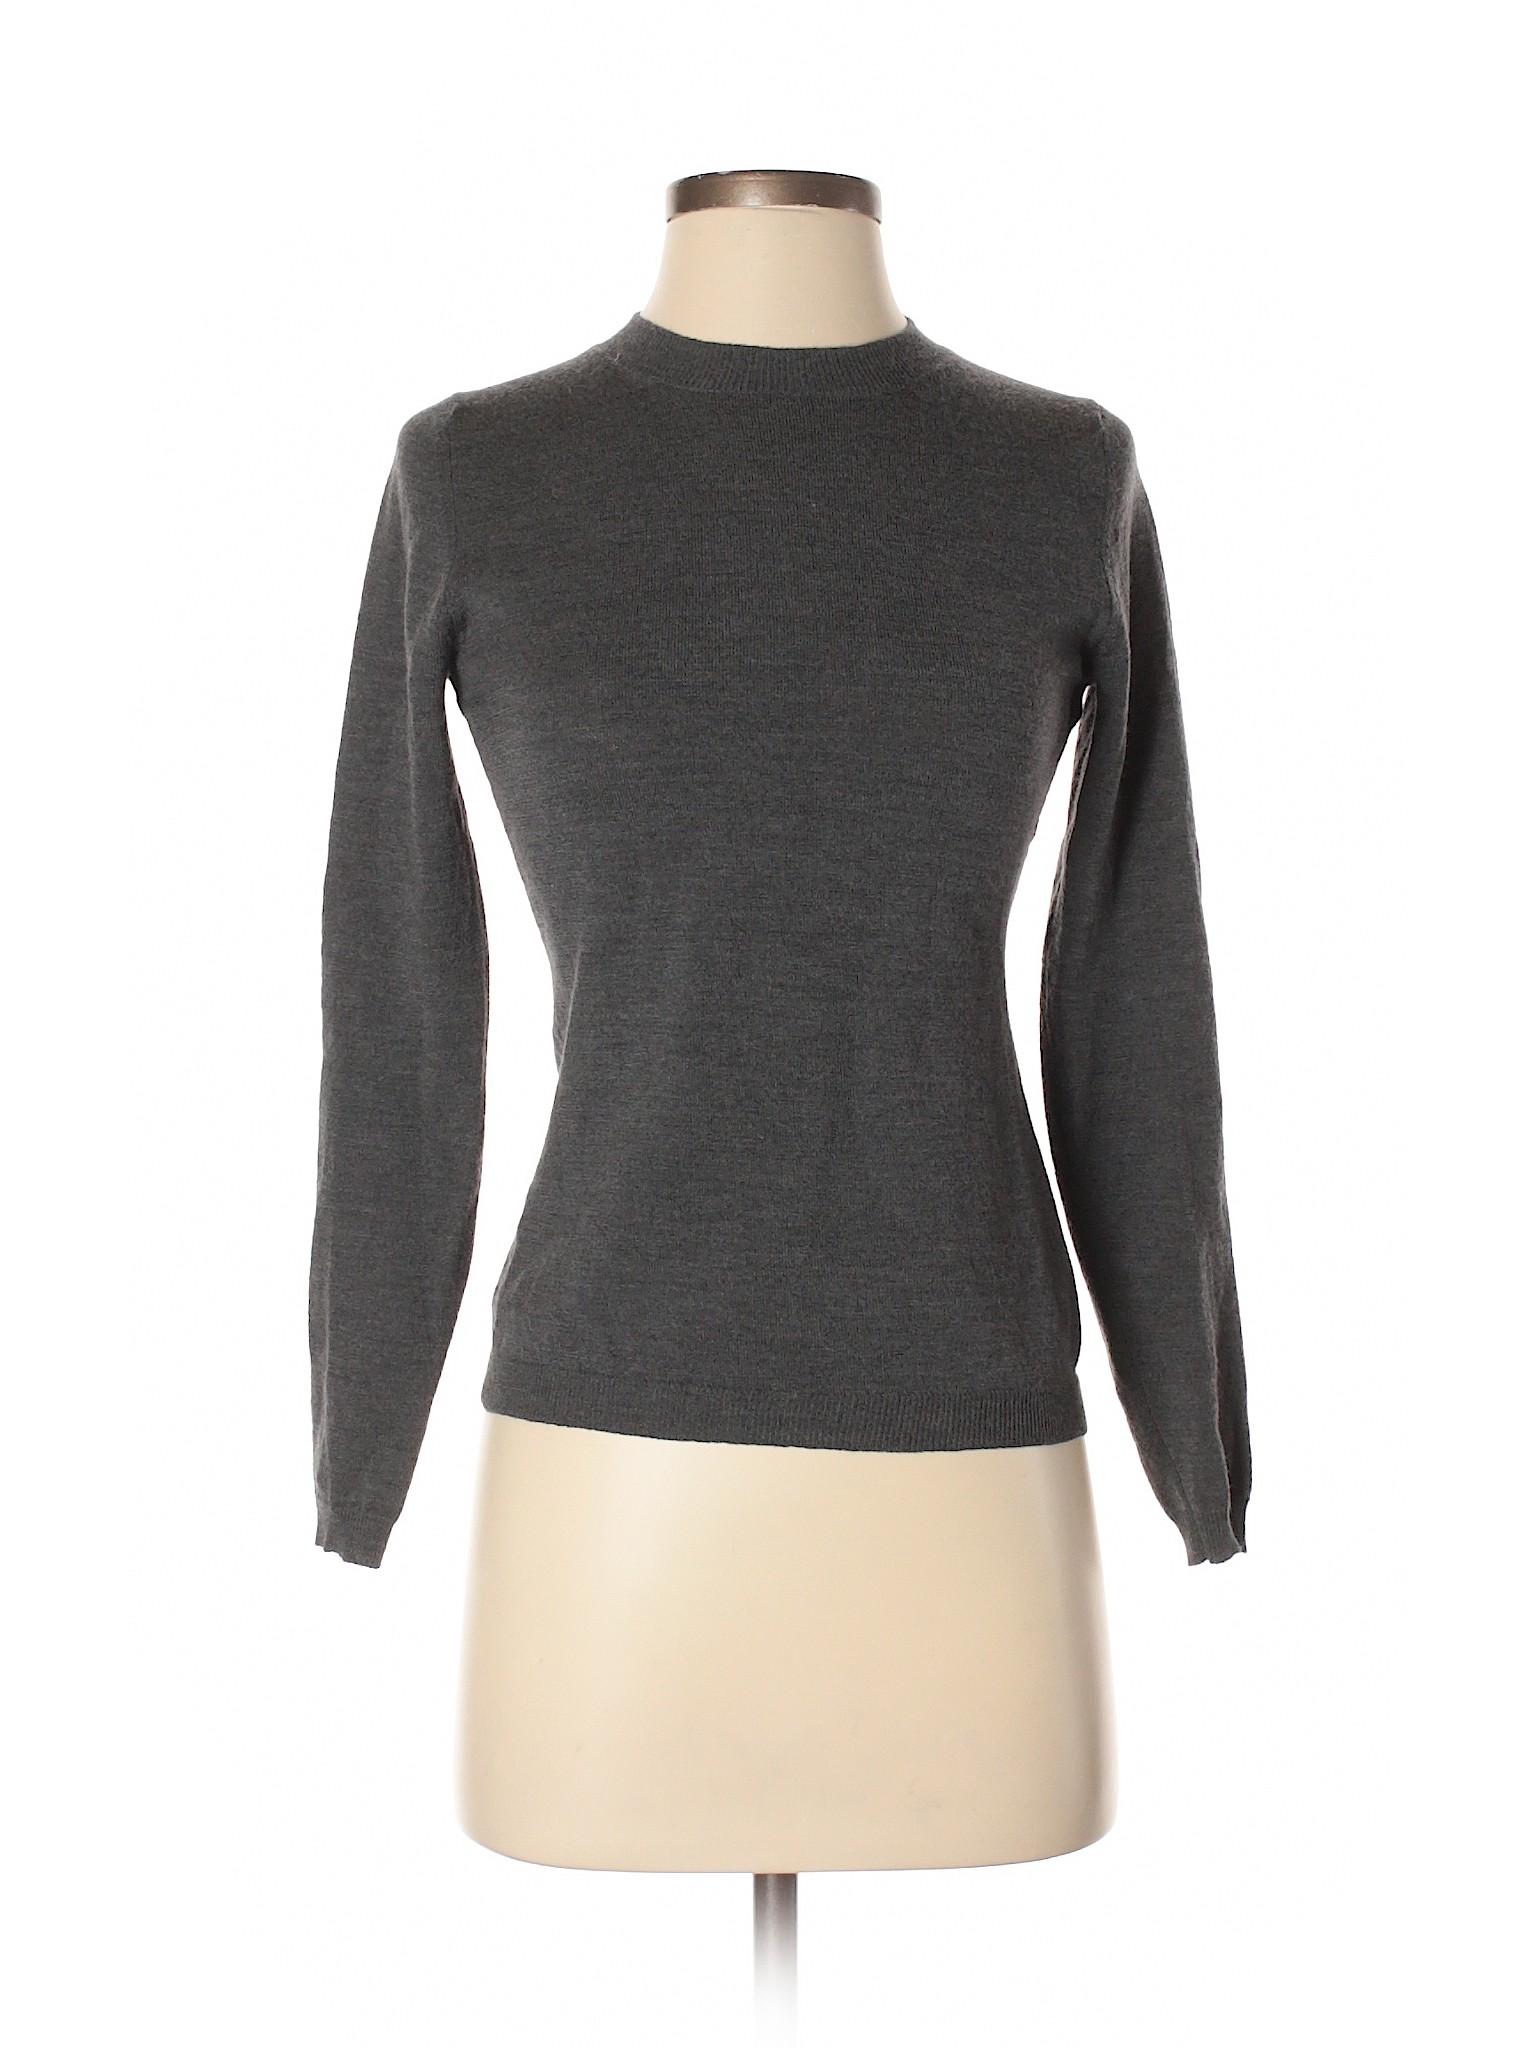 Wool Sweater winter Pullover Banana Republic Boutique wqg1xU